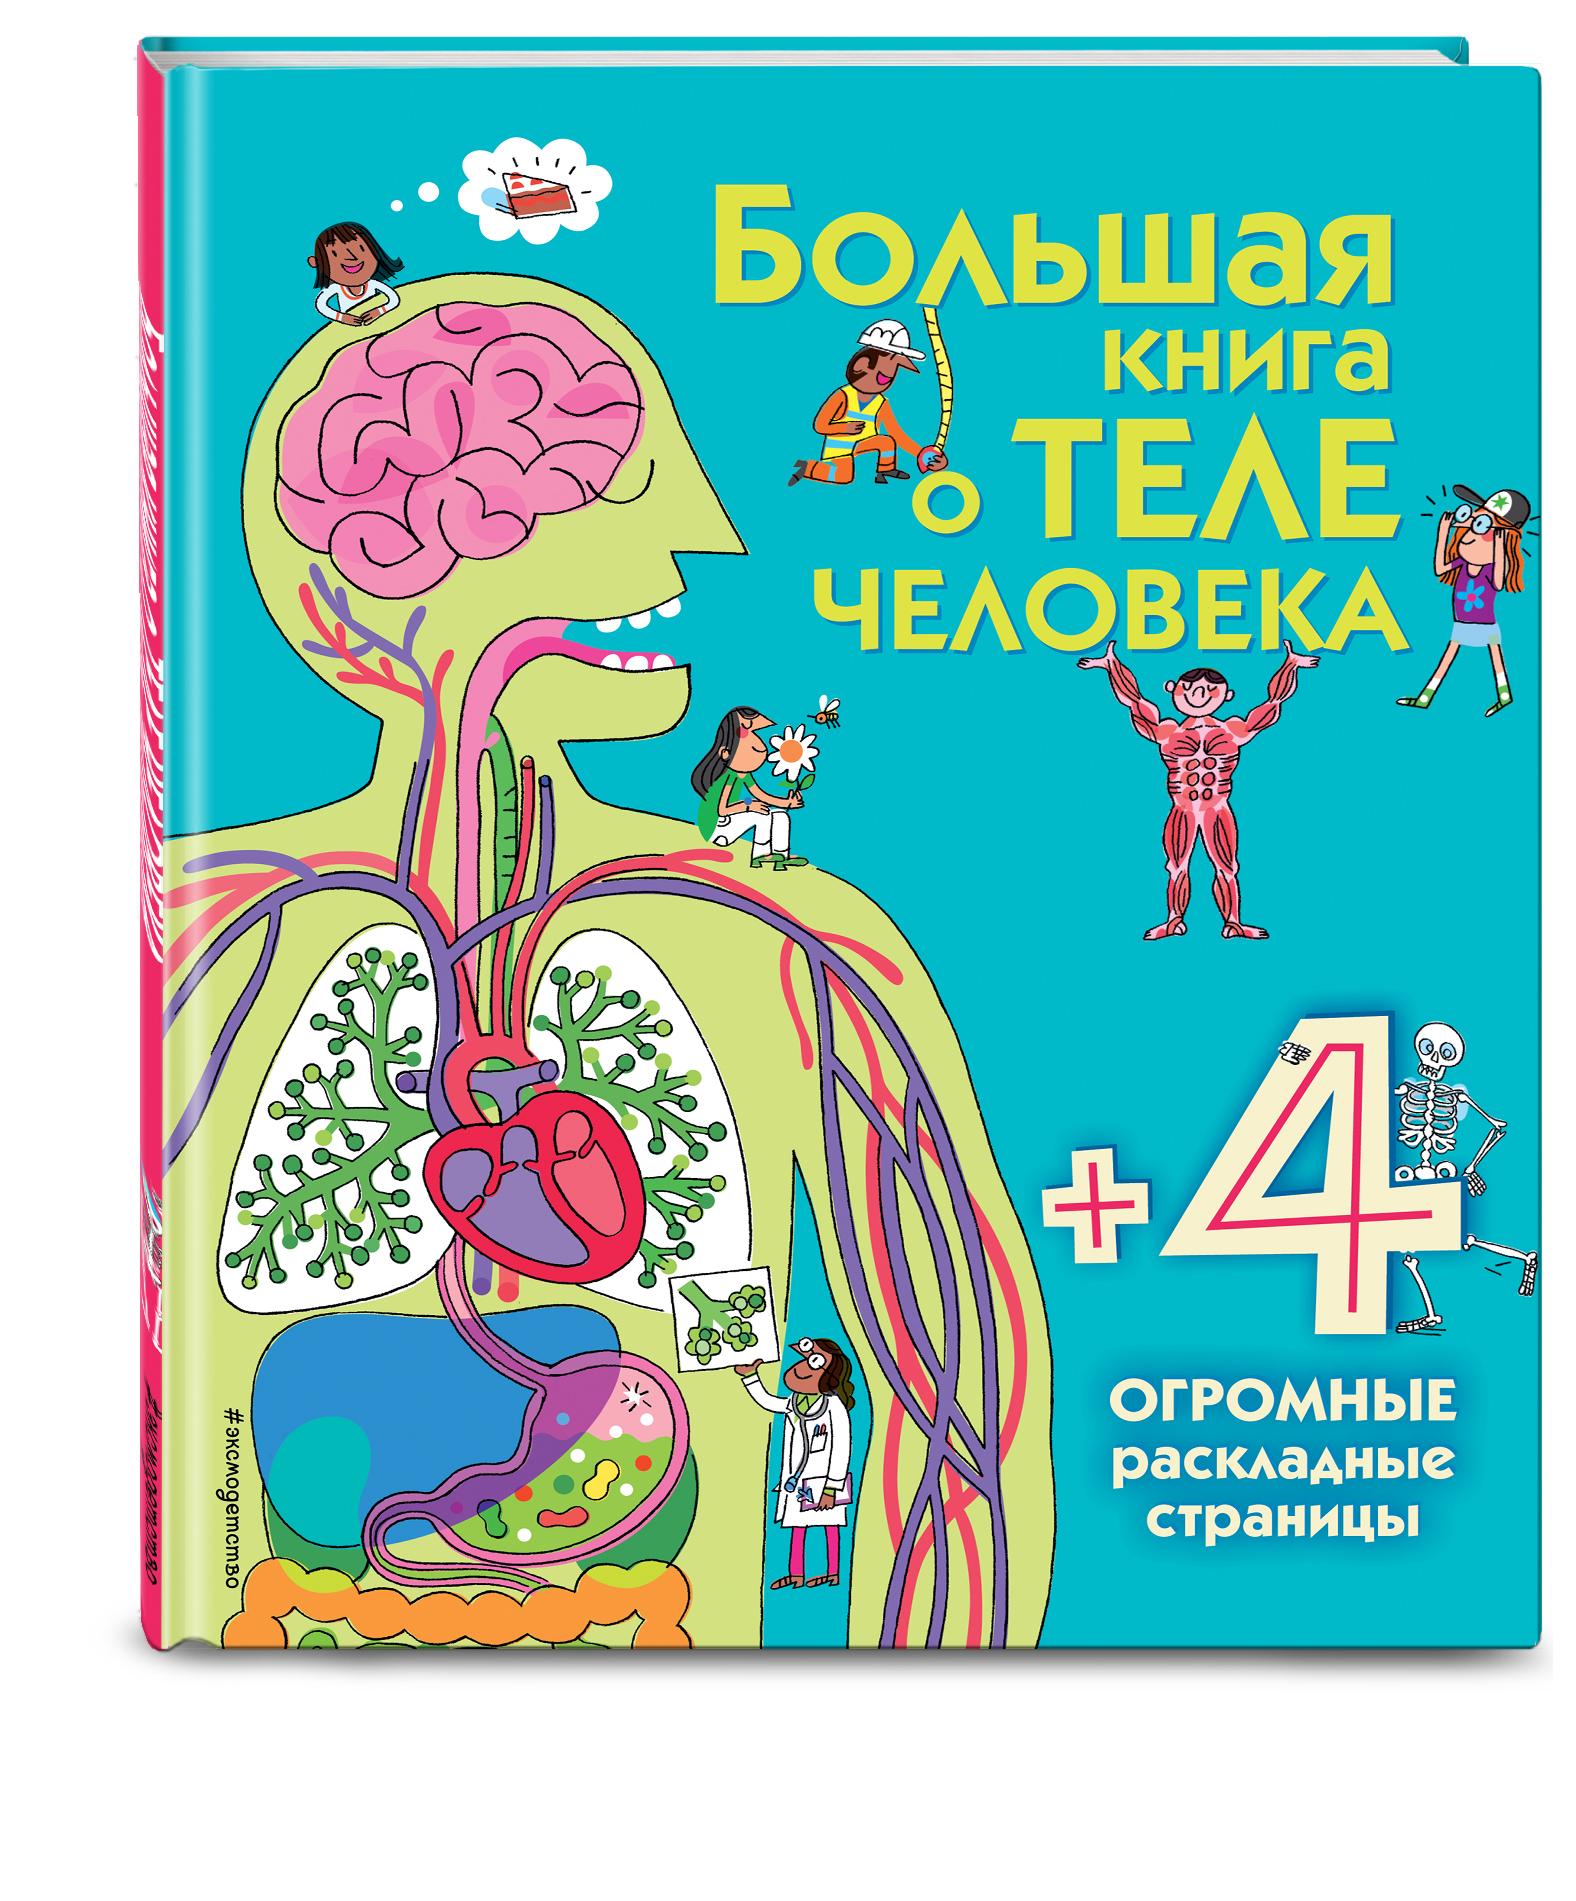 Большая книга о теле человека ISBN: 978-5-699-87667-9 цена